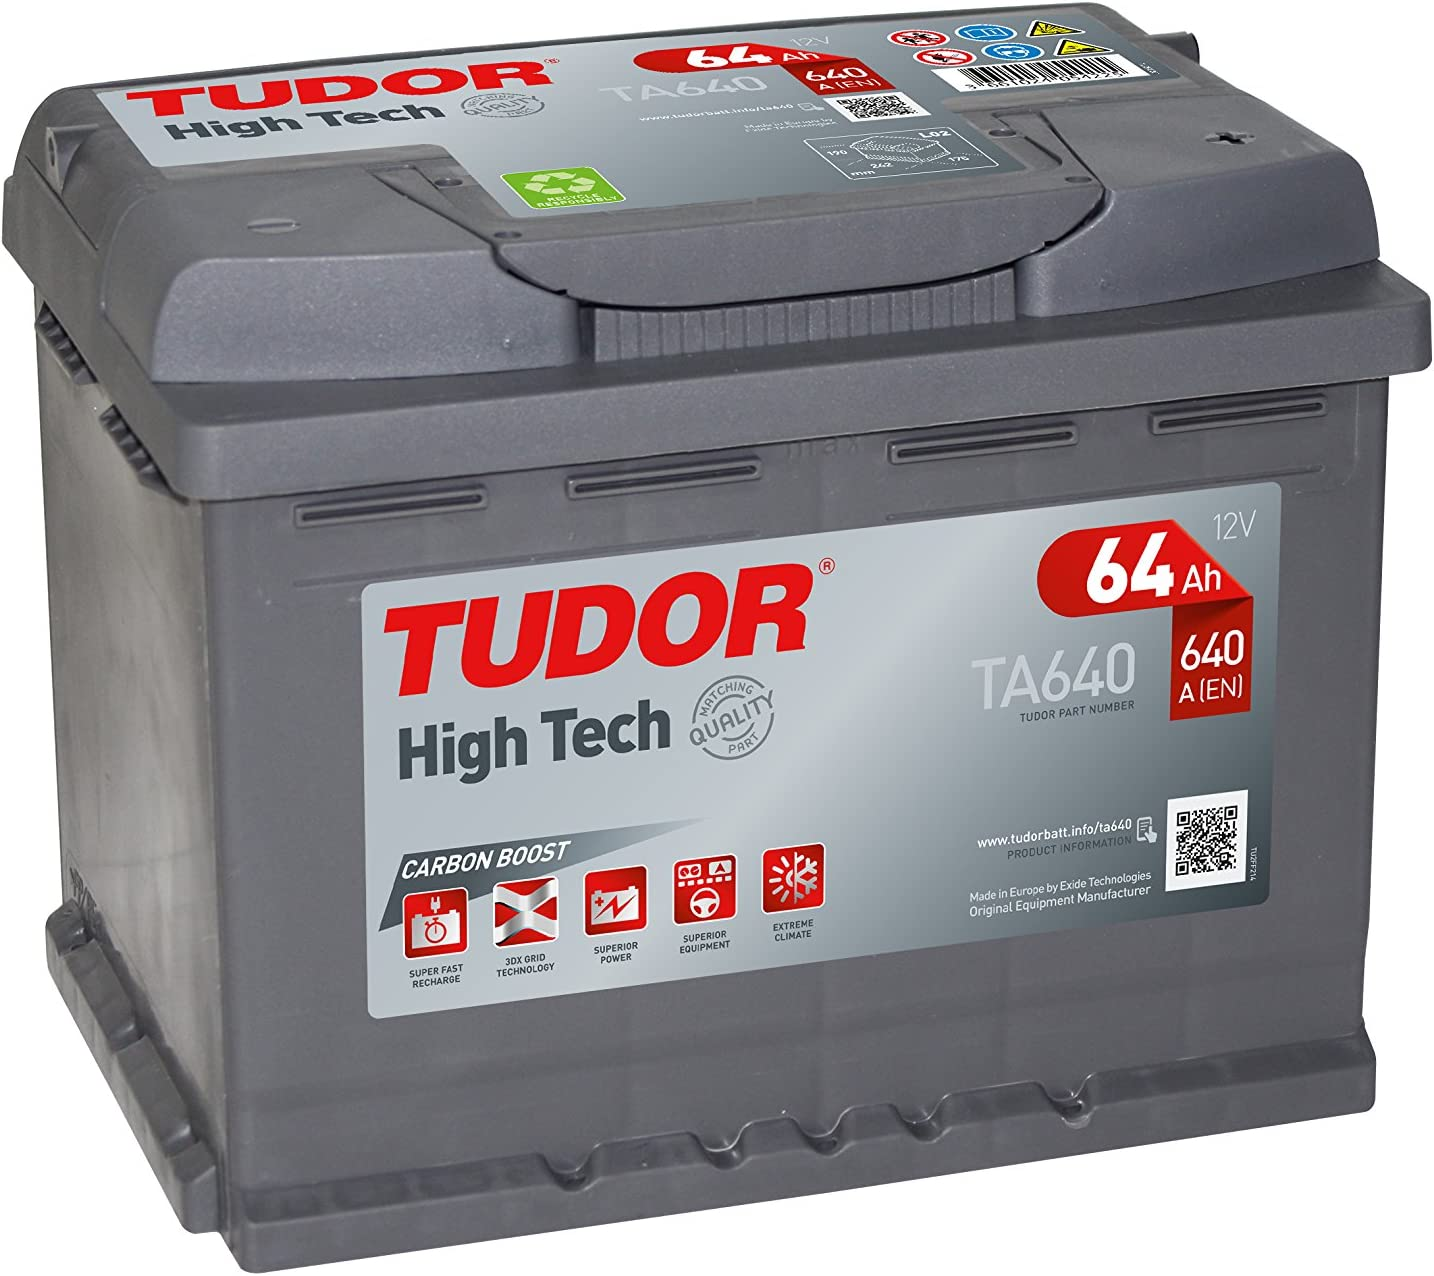 Batería para coche Tudor Exide HIGH-TECH 64Ah, 12V. Dimensiones: 242 x 175 x 190. Borne derecha.